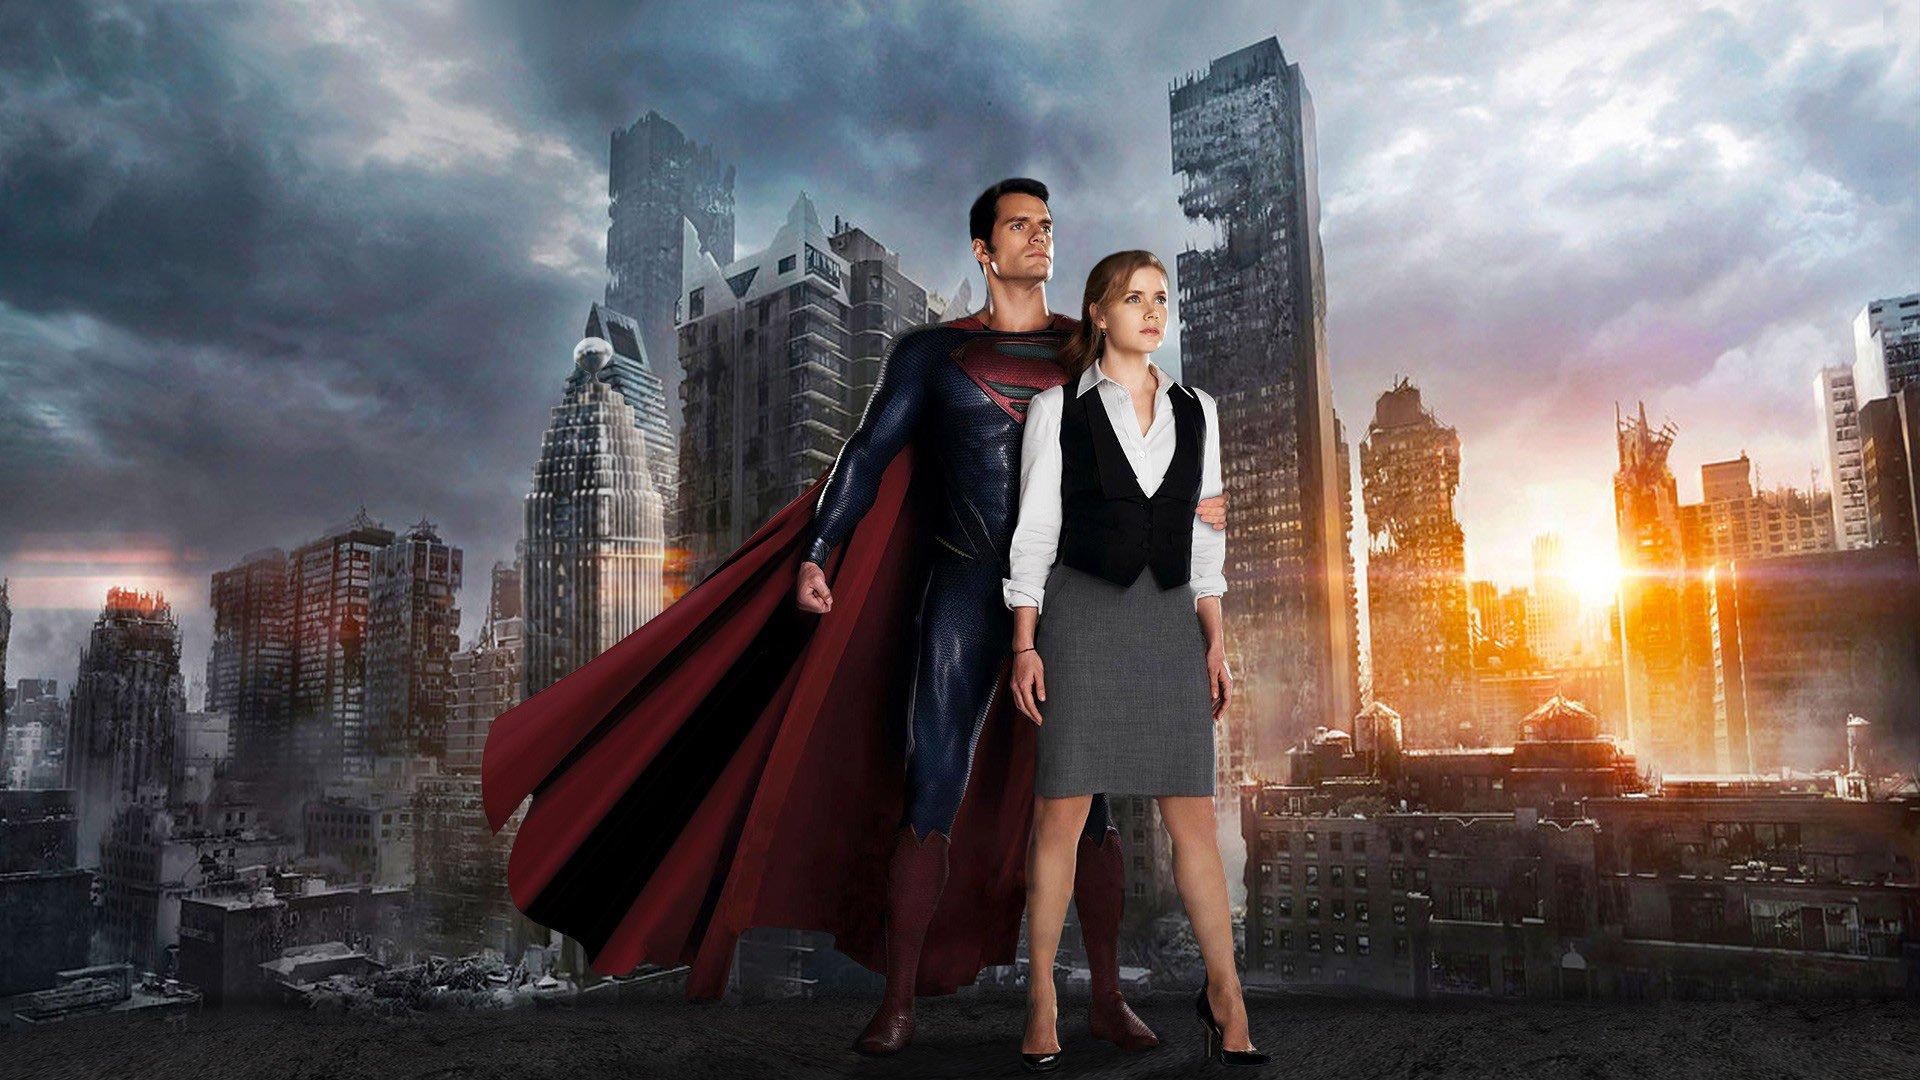 superman-henry-cavill-lois-lane-amy-adams-man-of-steel